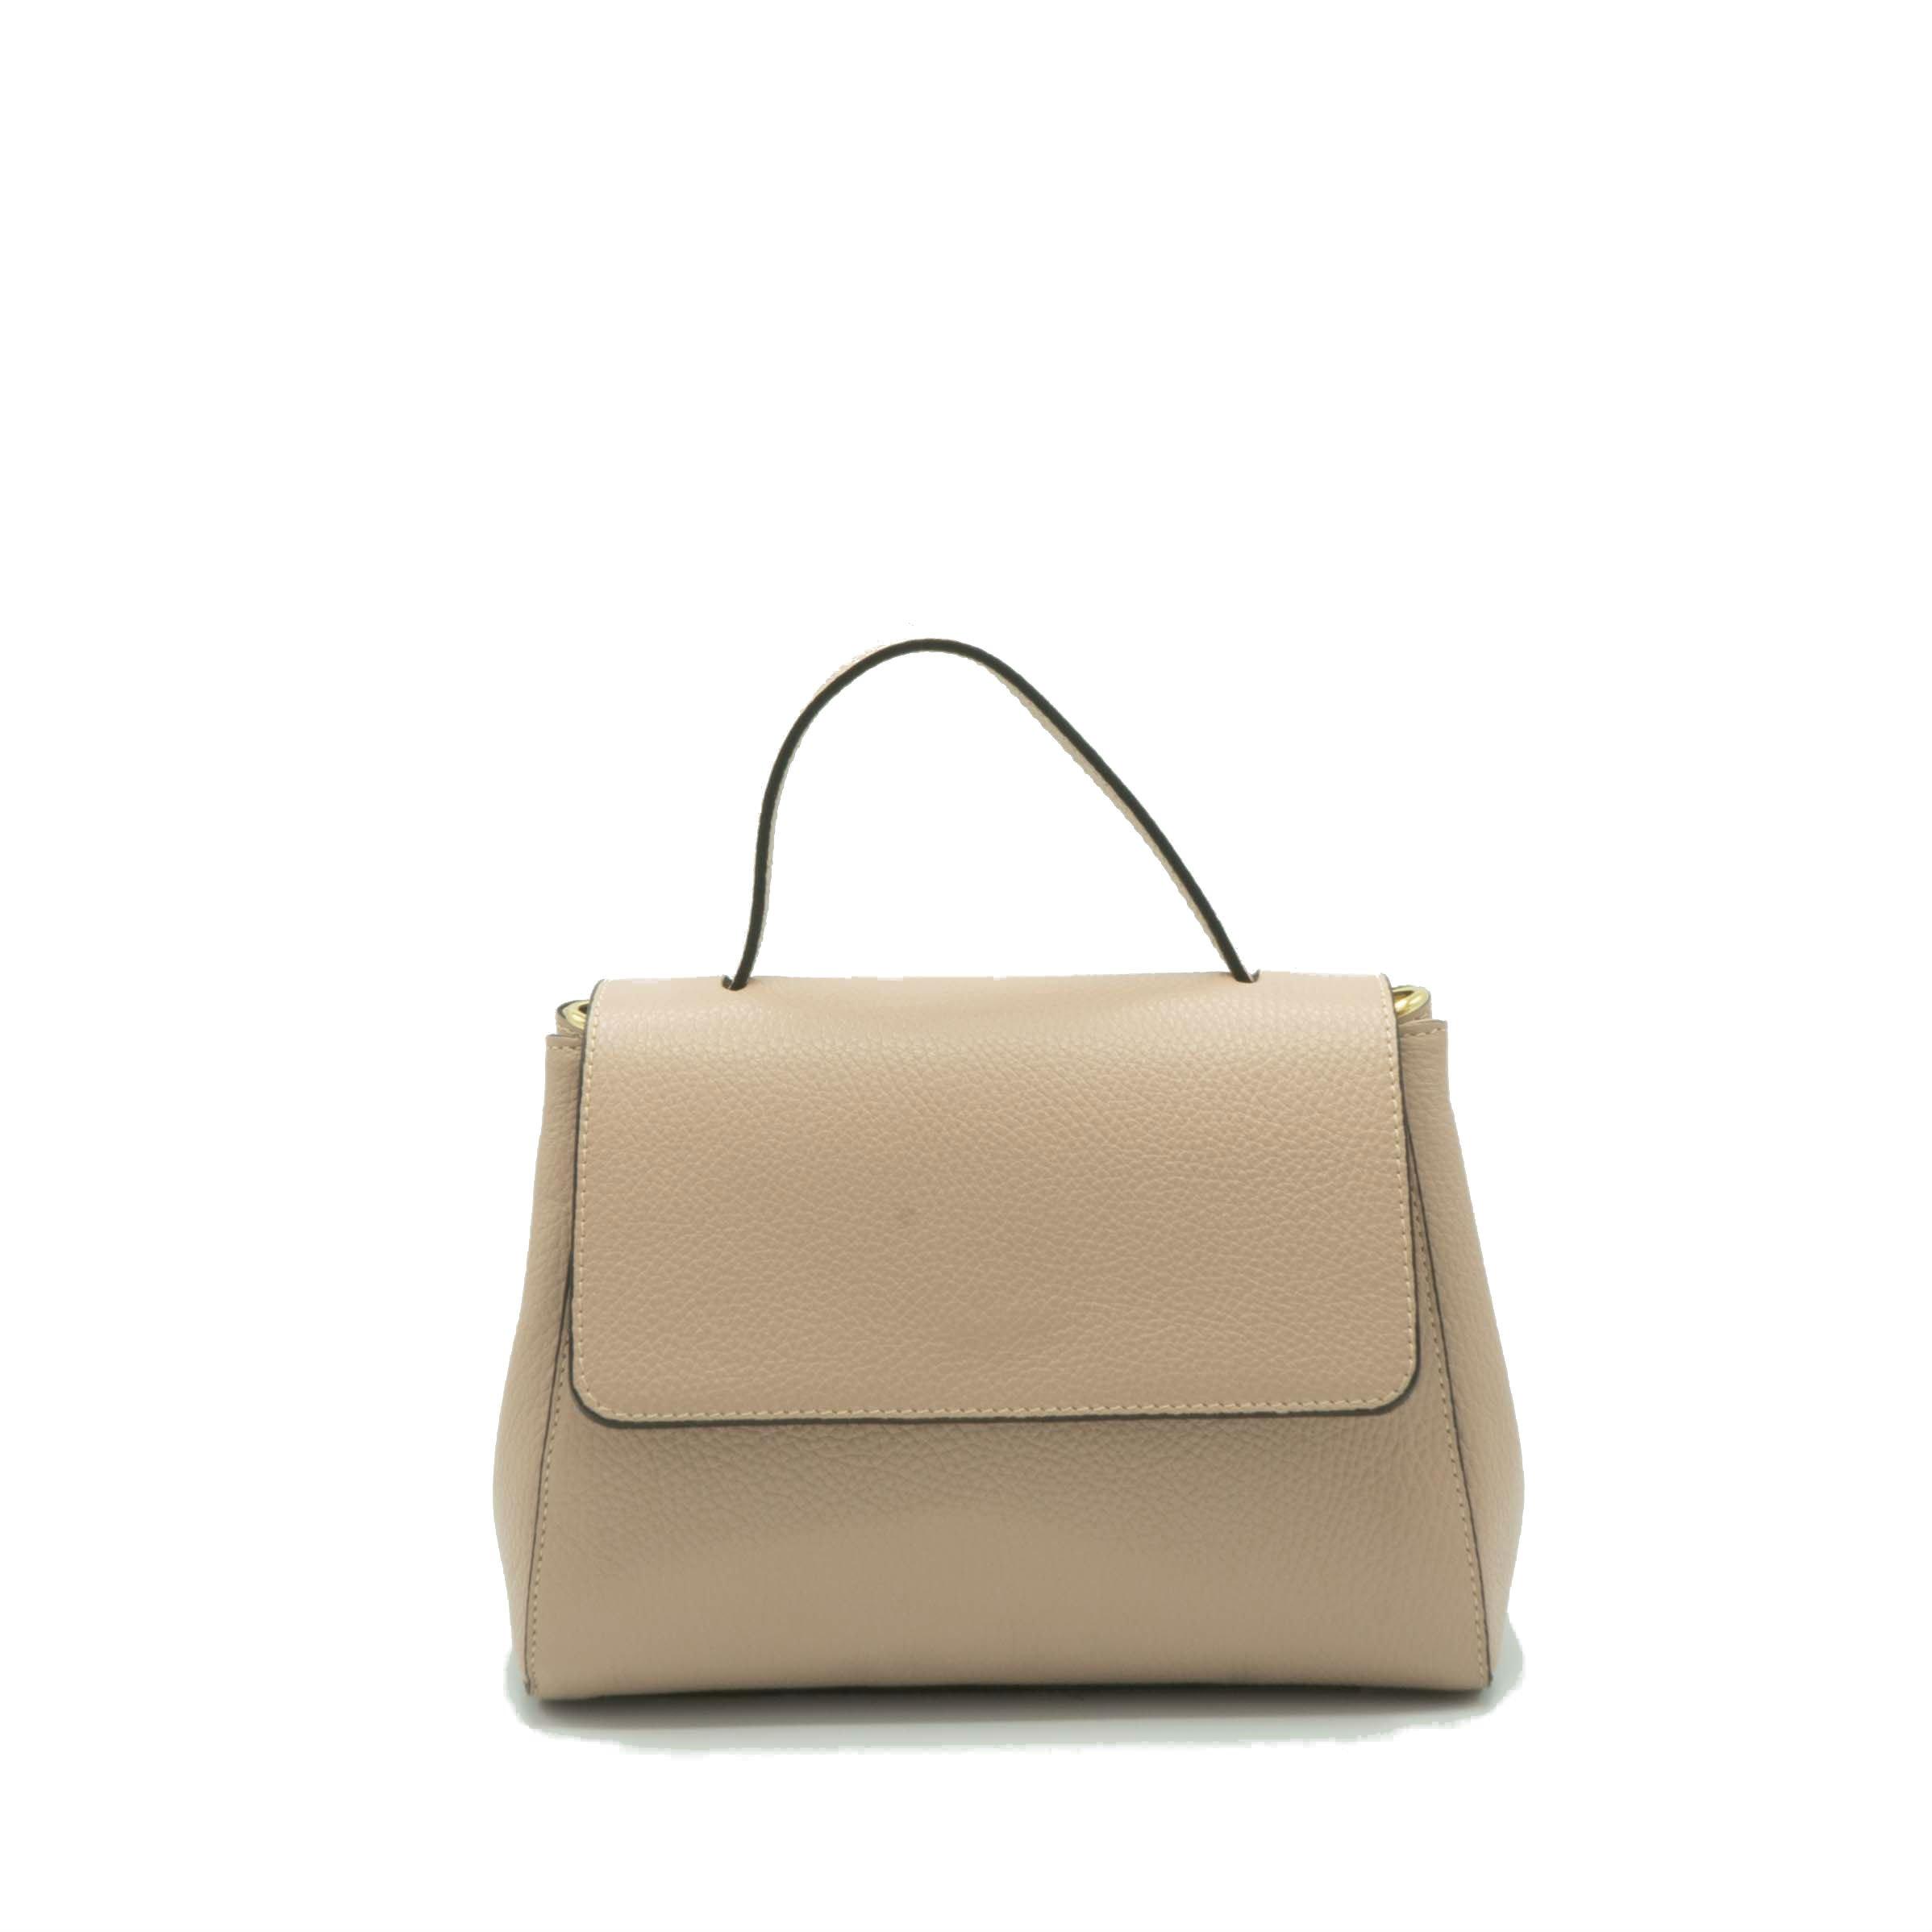 3de6317a731 ... giuliano dames luxe kantoortassen fashionbags kopen achterkant. Back to  HandtassenSchoudertassenTassenLeren Tassen